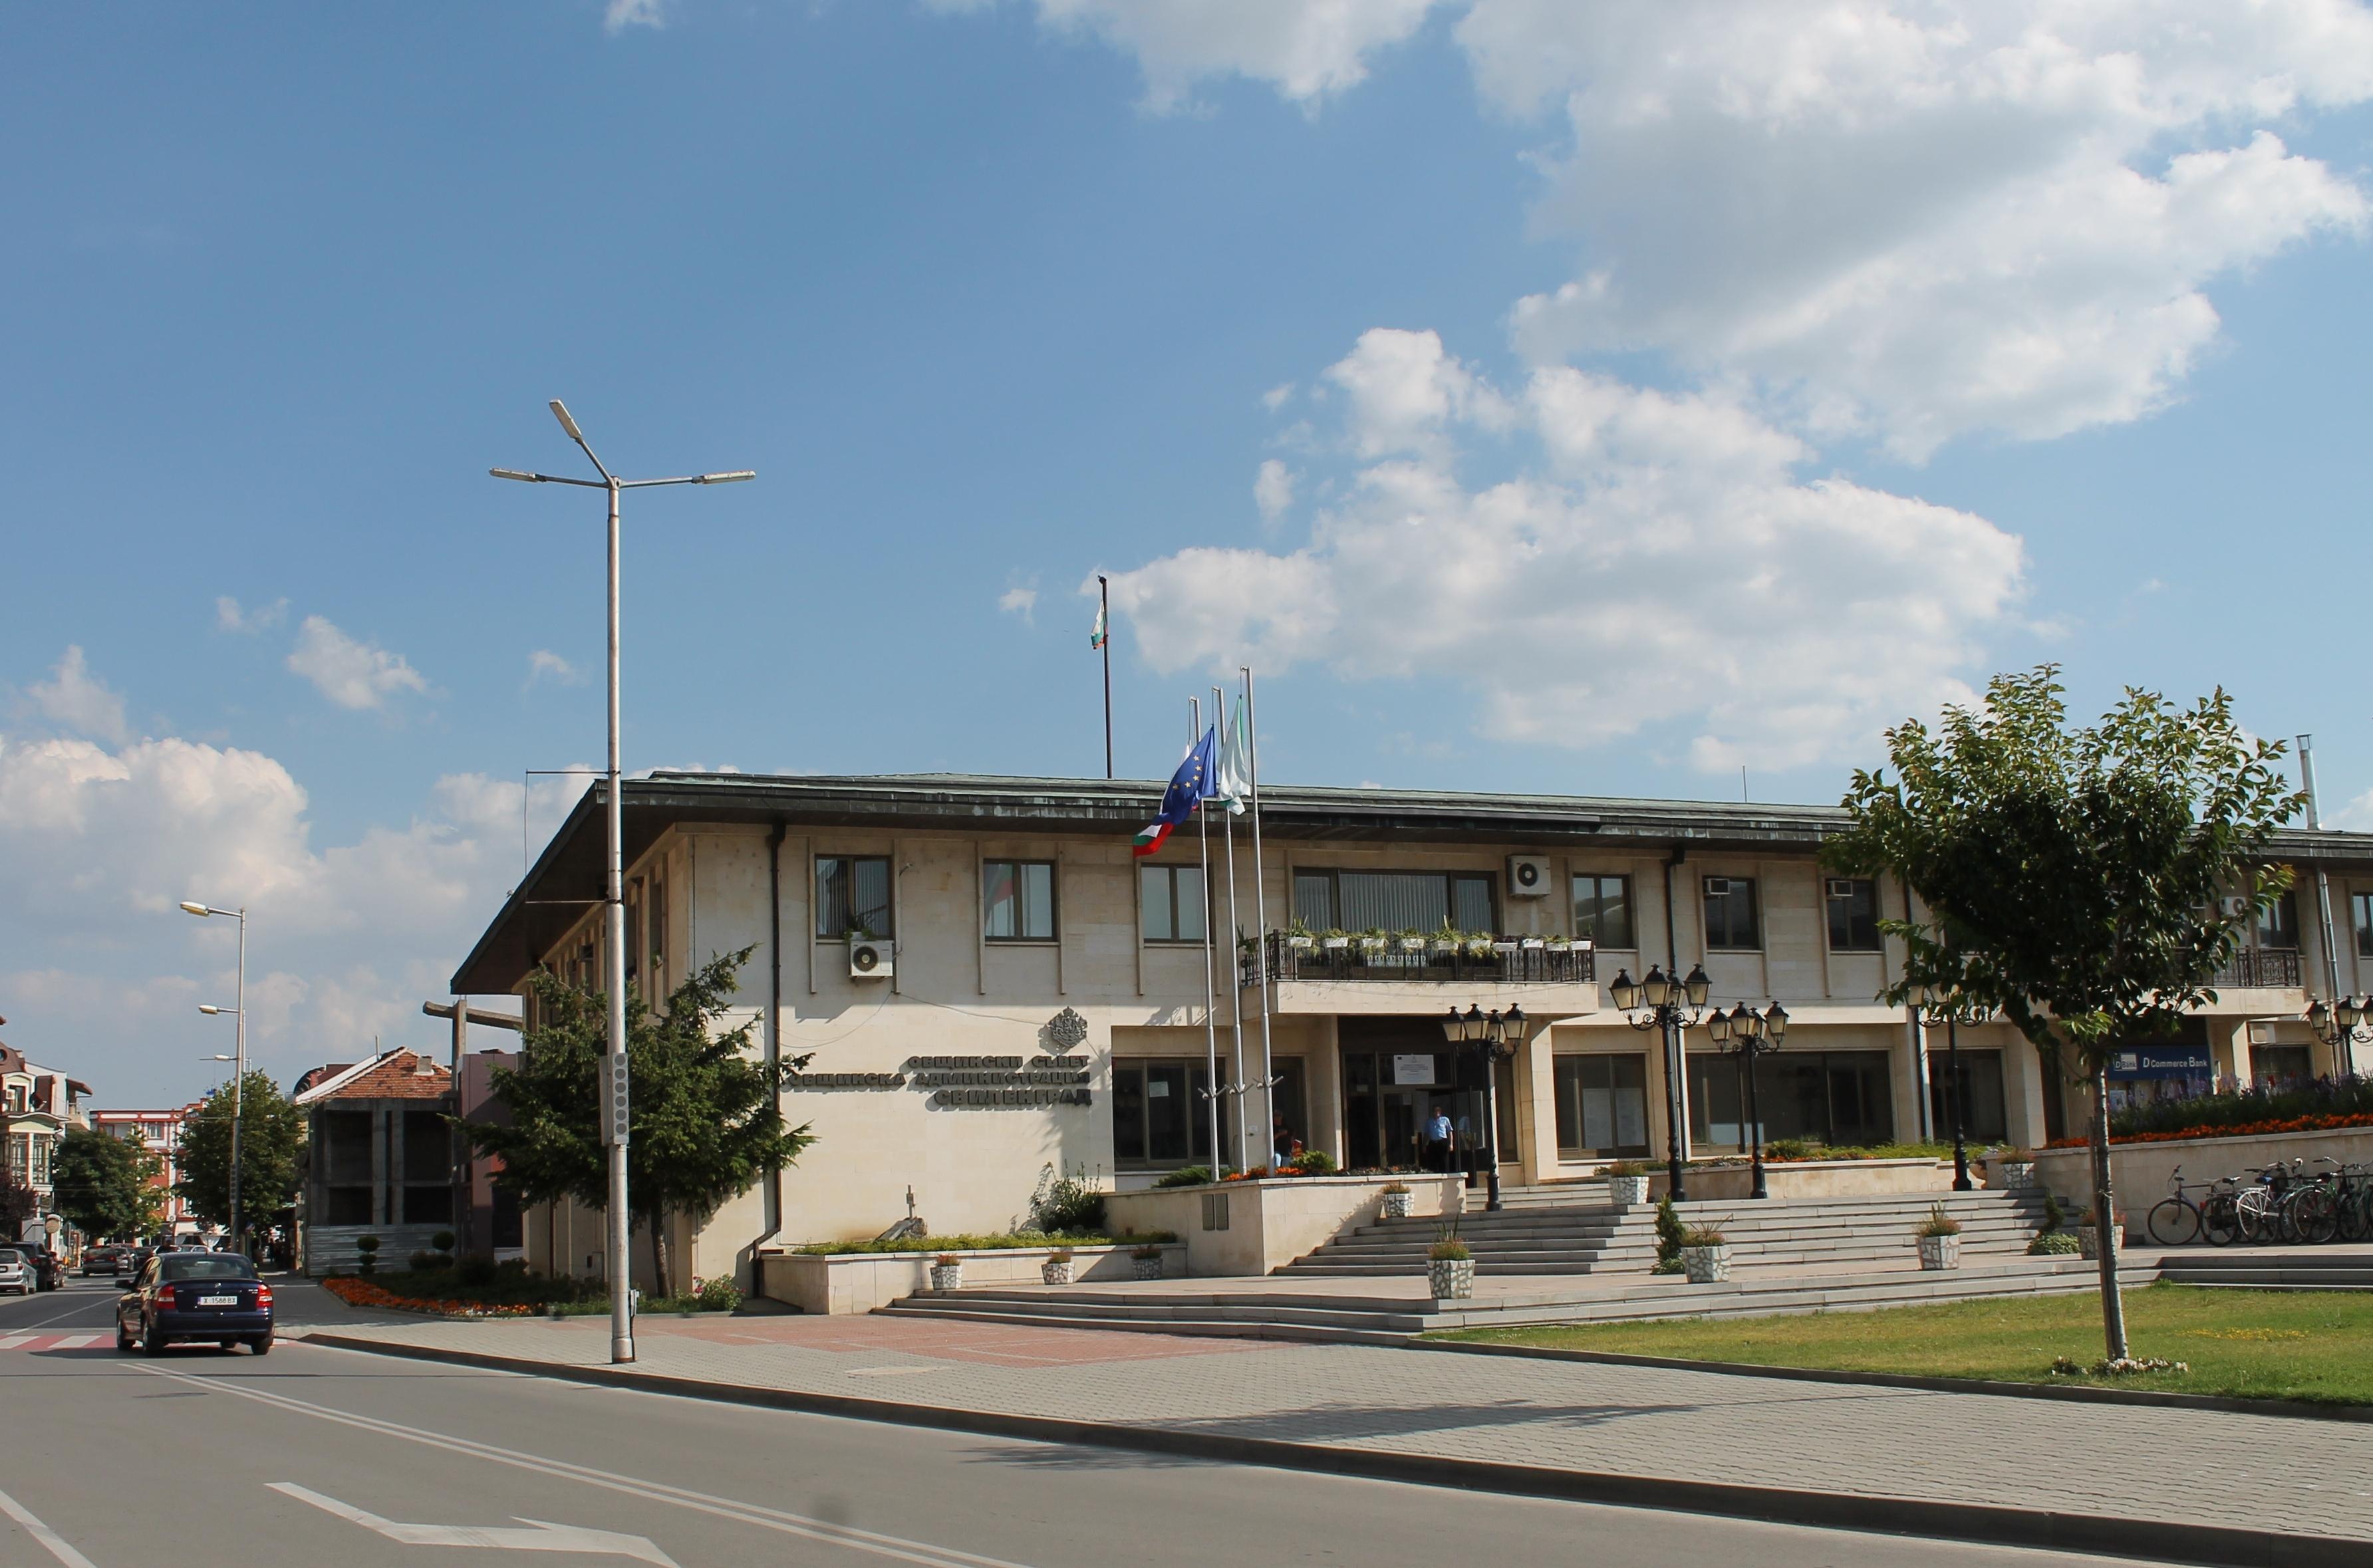 Аткуалните мерки против коронавирус в община Свиленград